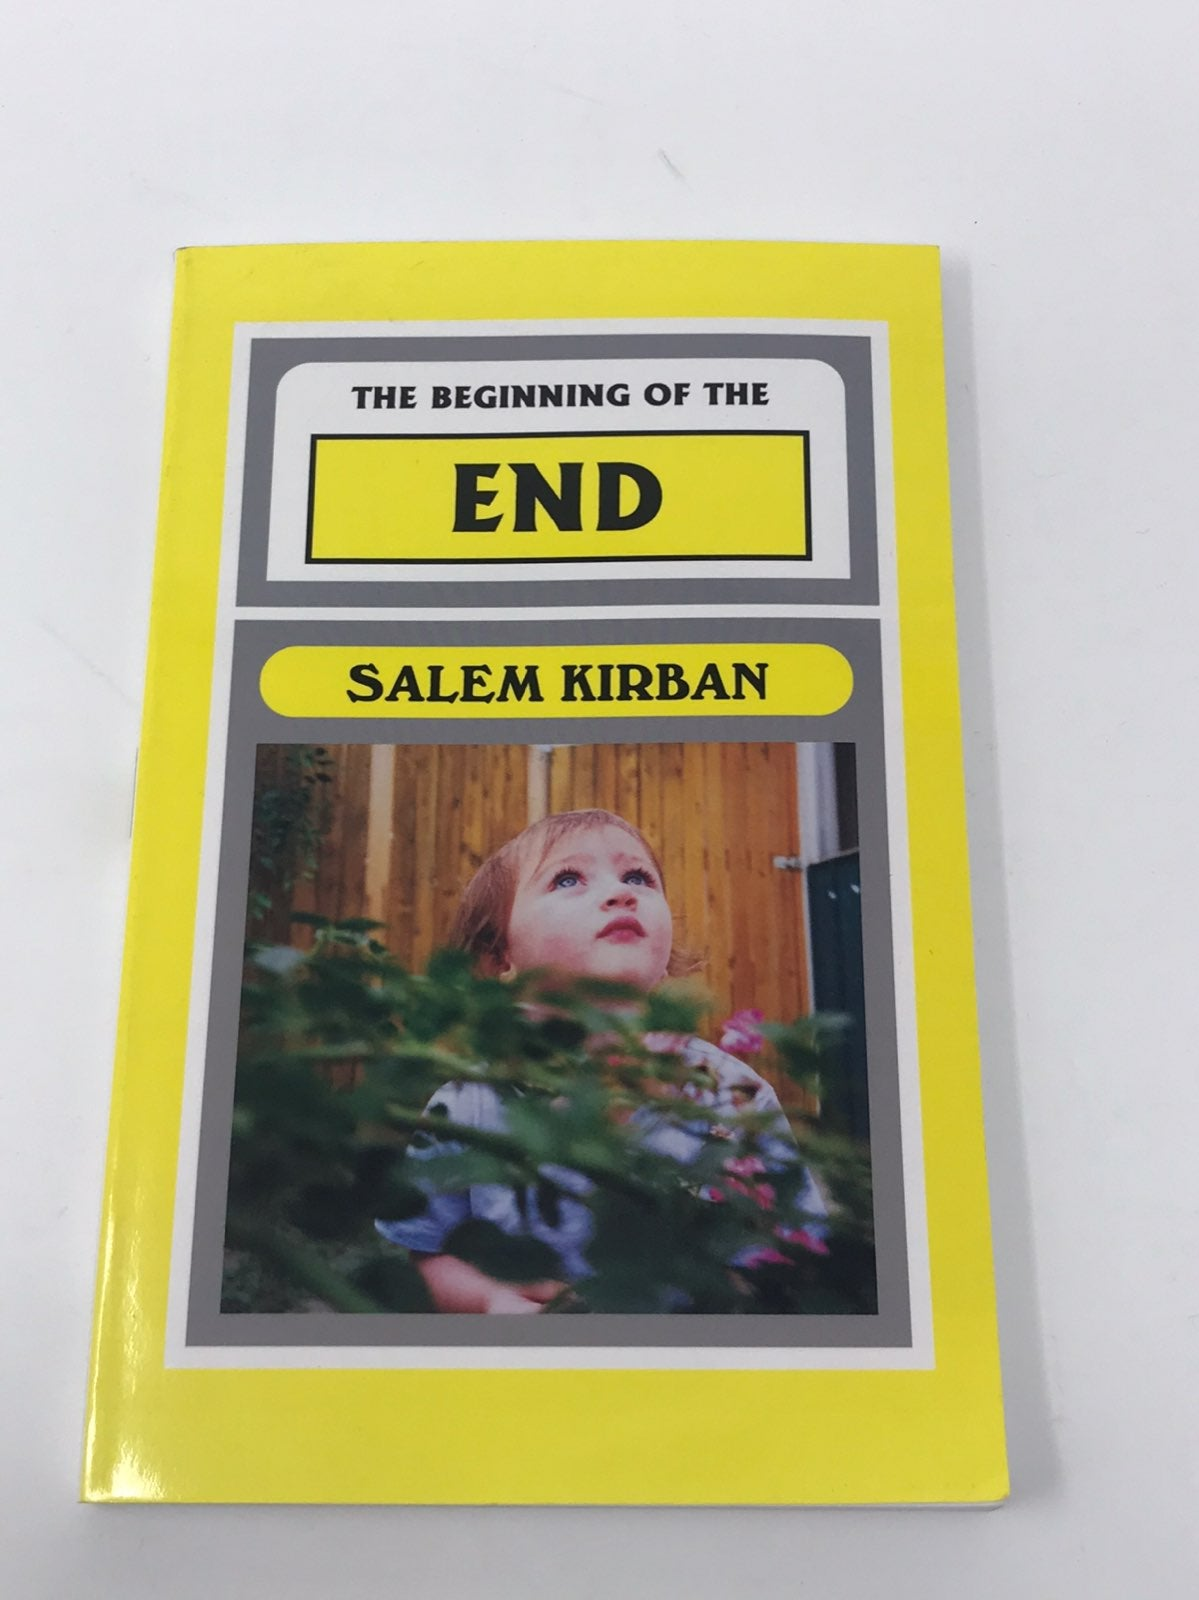 Book of Salem Kirban